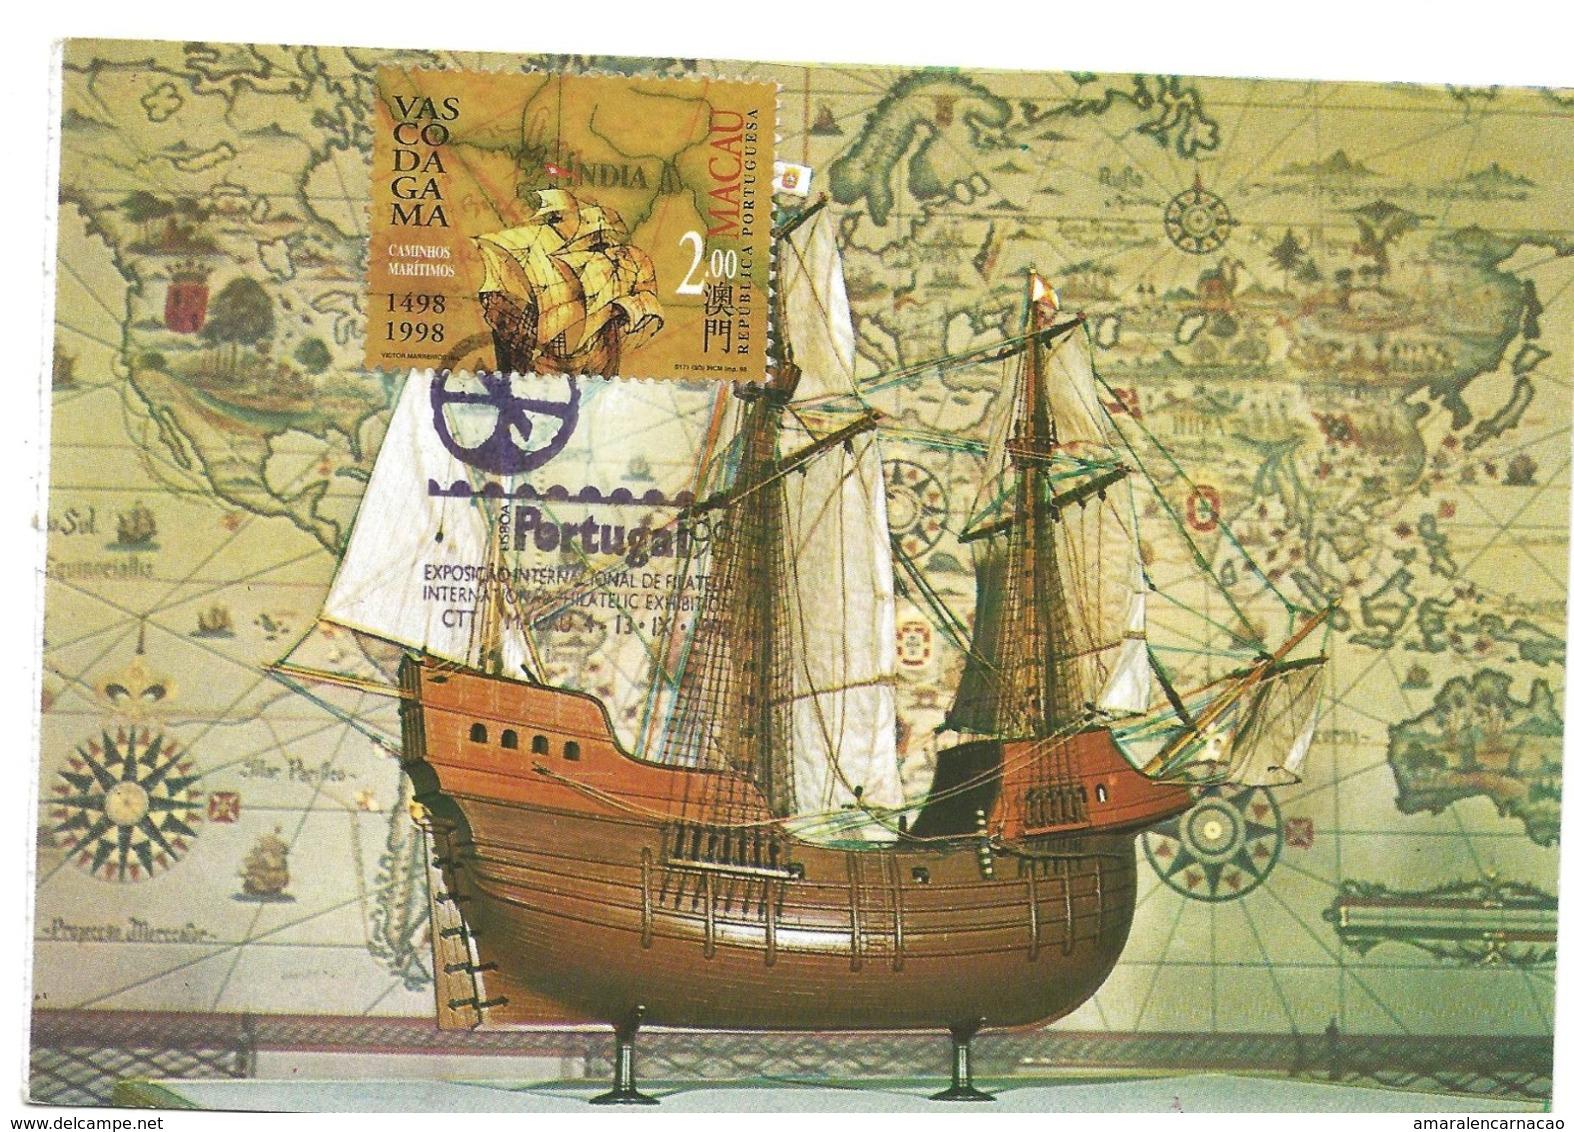 CARTE MAXIMUM- MAXIMUM KARTE - MAXIMUM CARD- MACAU/MACAO - VASCO DA GAMA ET LA VOYAGE POUR MER À INDE -1498-1998 -BATEAU - Geschiedenis